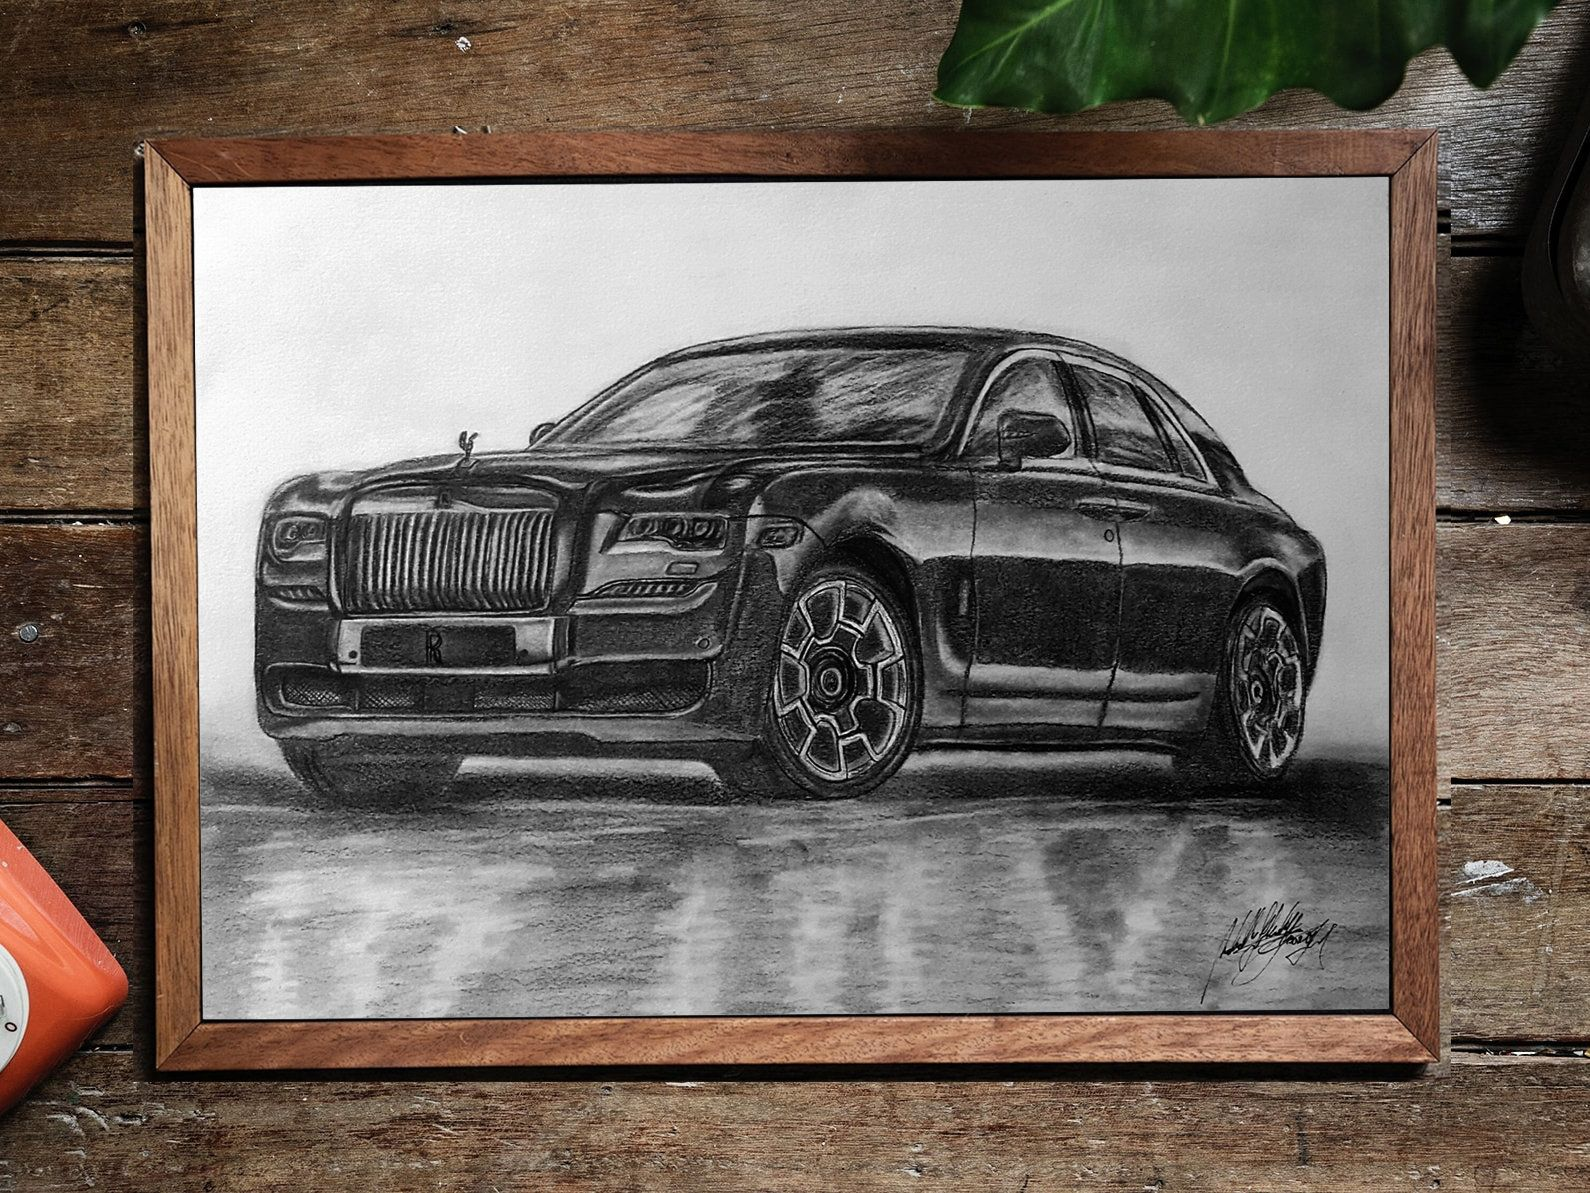 Rolls Royce Ghost Interior CARS1804 Art Print Poster A4 A3 A2 A1